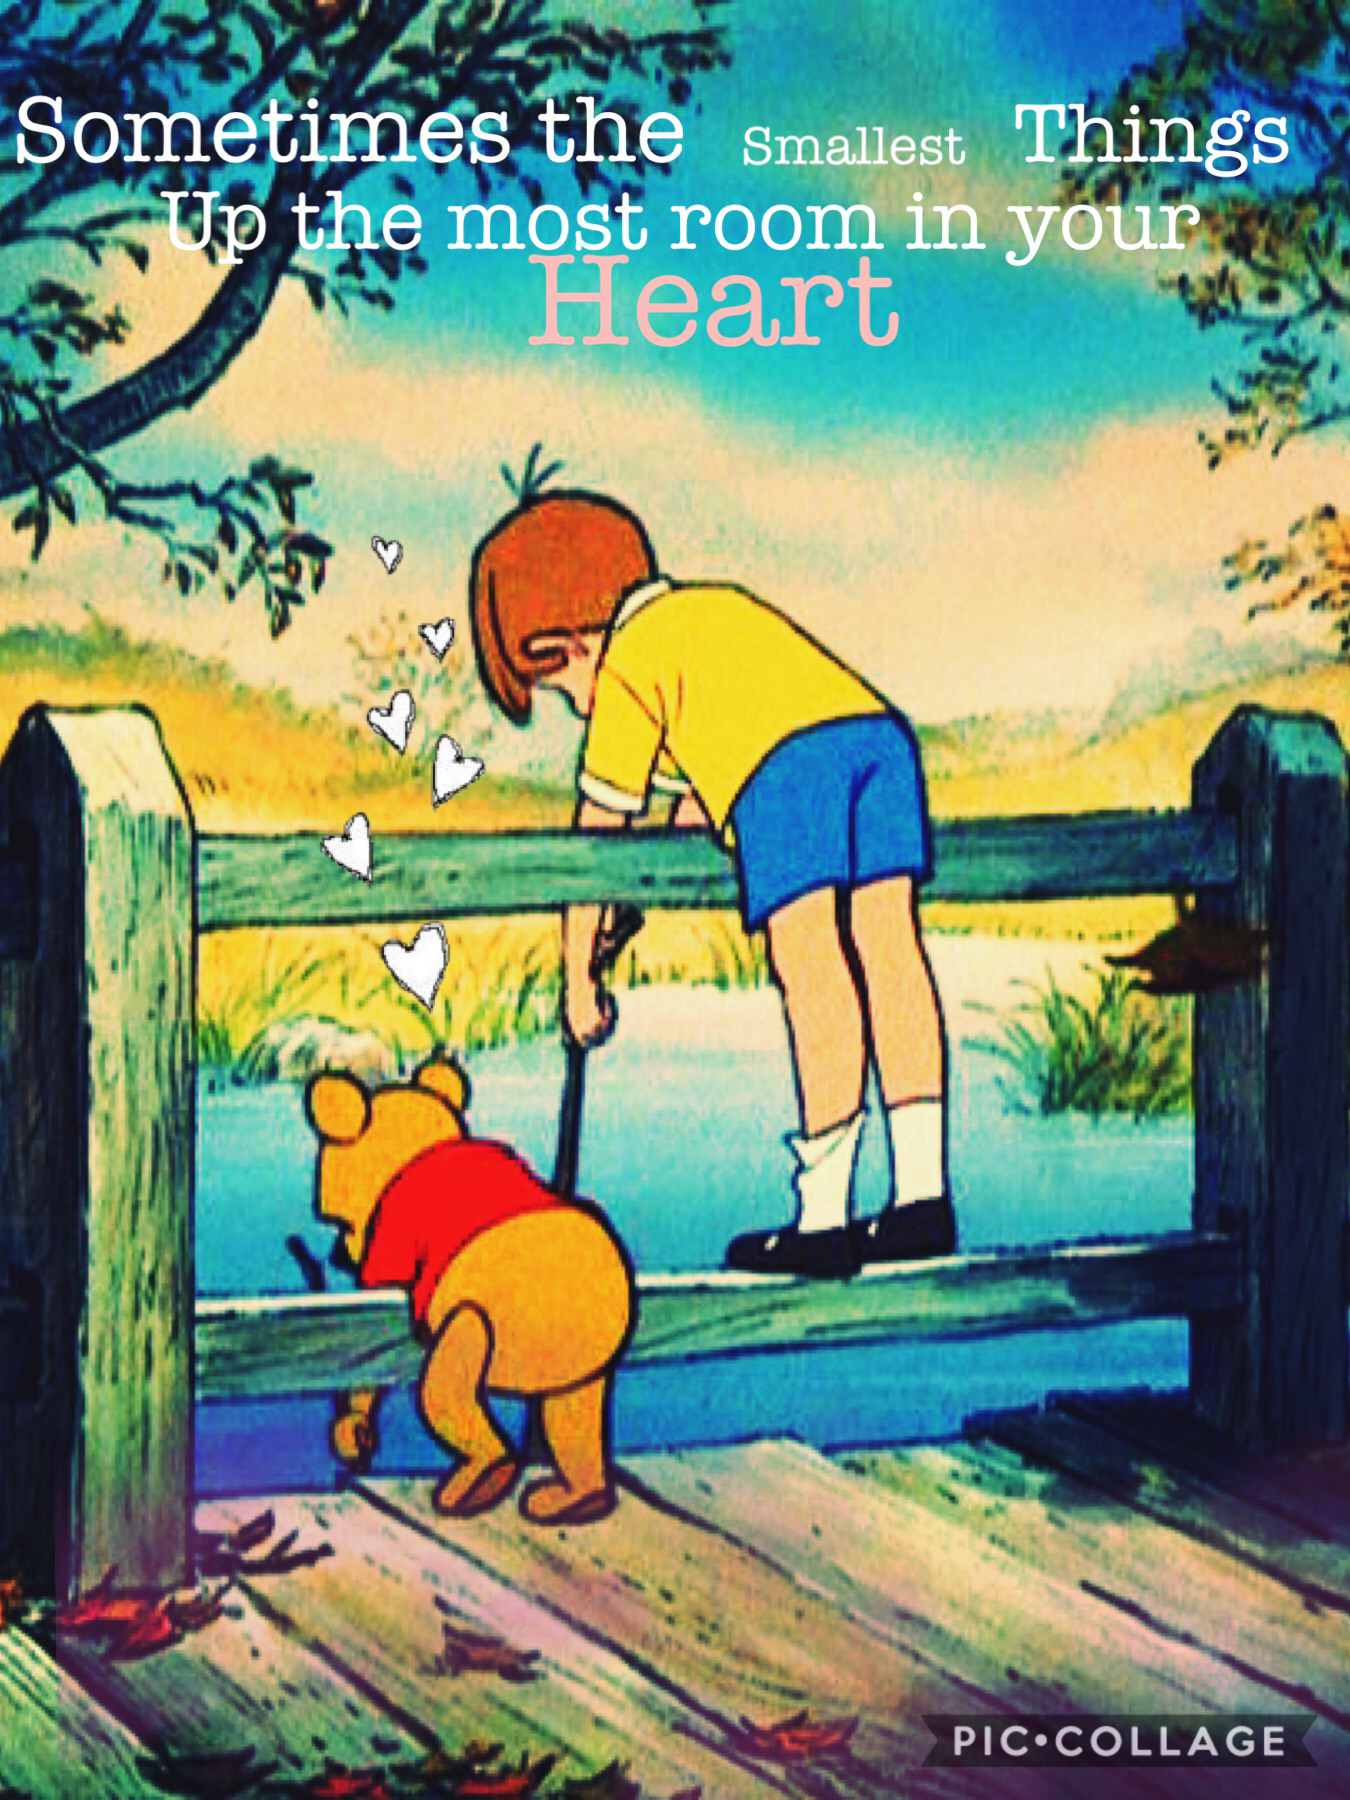 Ughh I tried. Love for a love 💕?